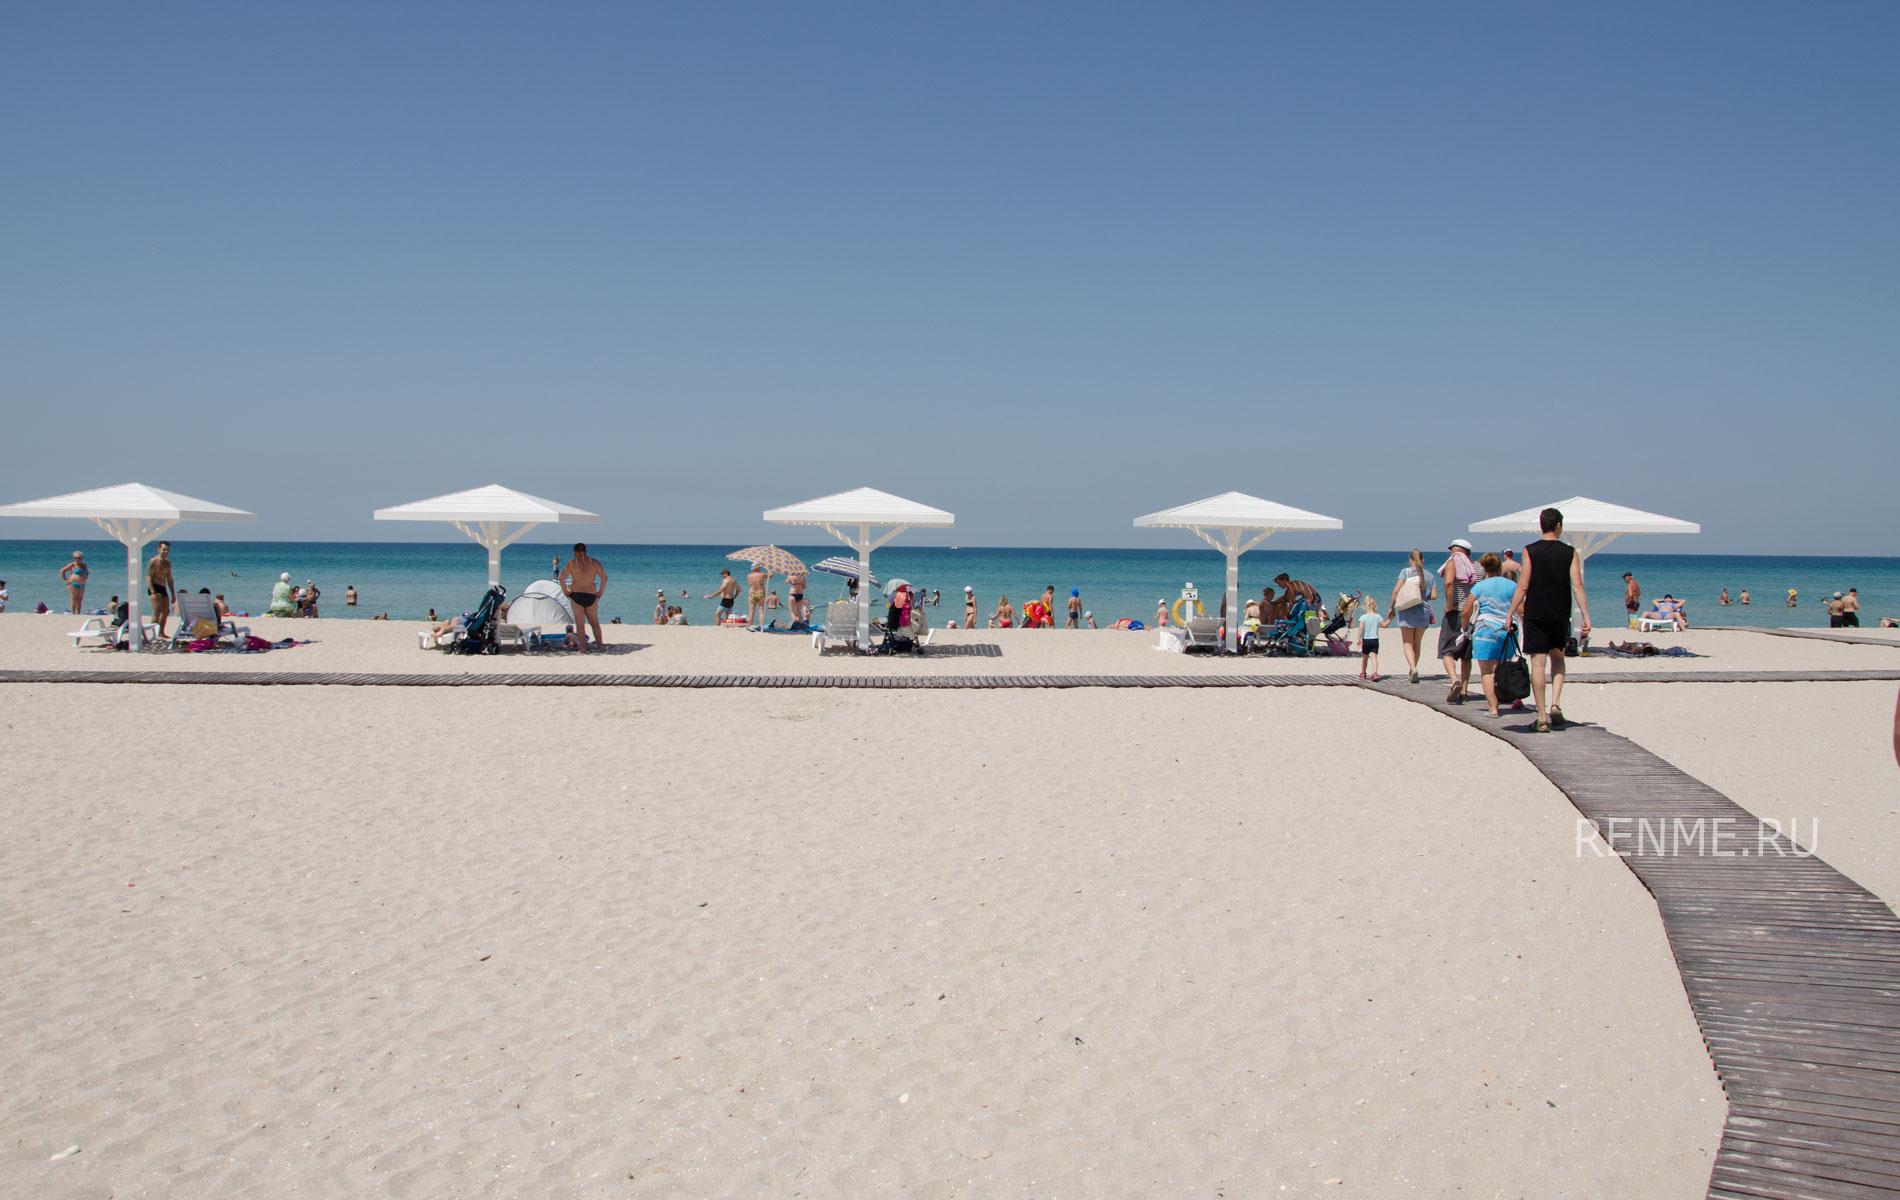 Фото пляжа в Оленевке. Фото Оленевки